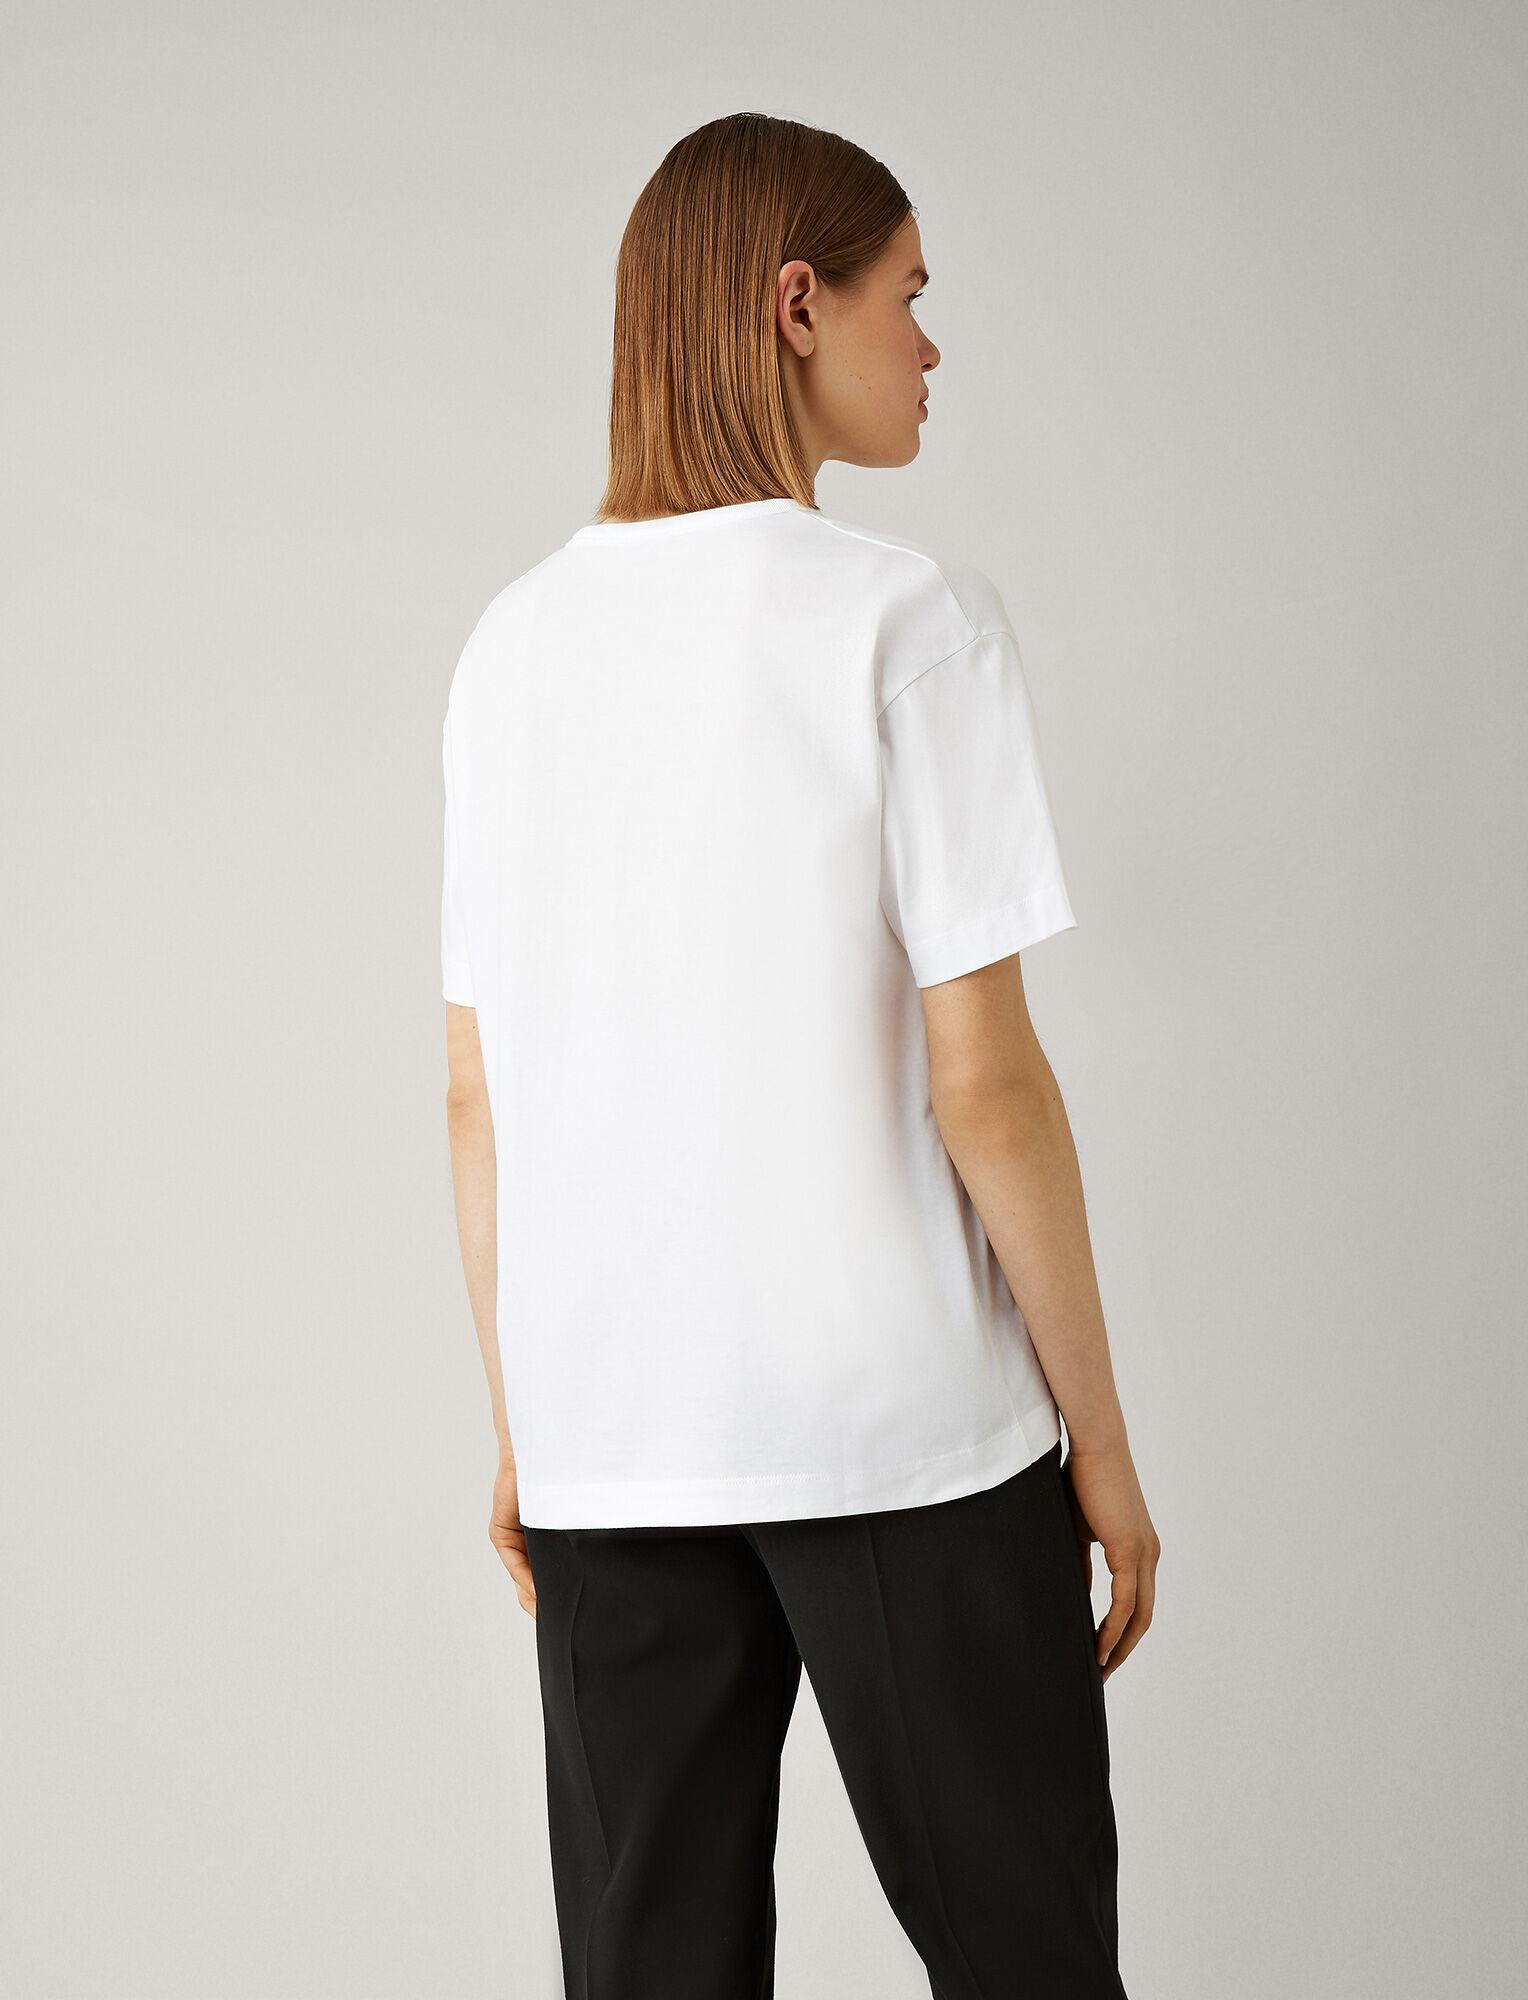 Joseph, Tee-shirt Perfect à col V en jersey, in WHITE